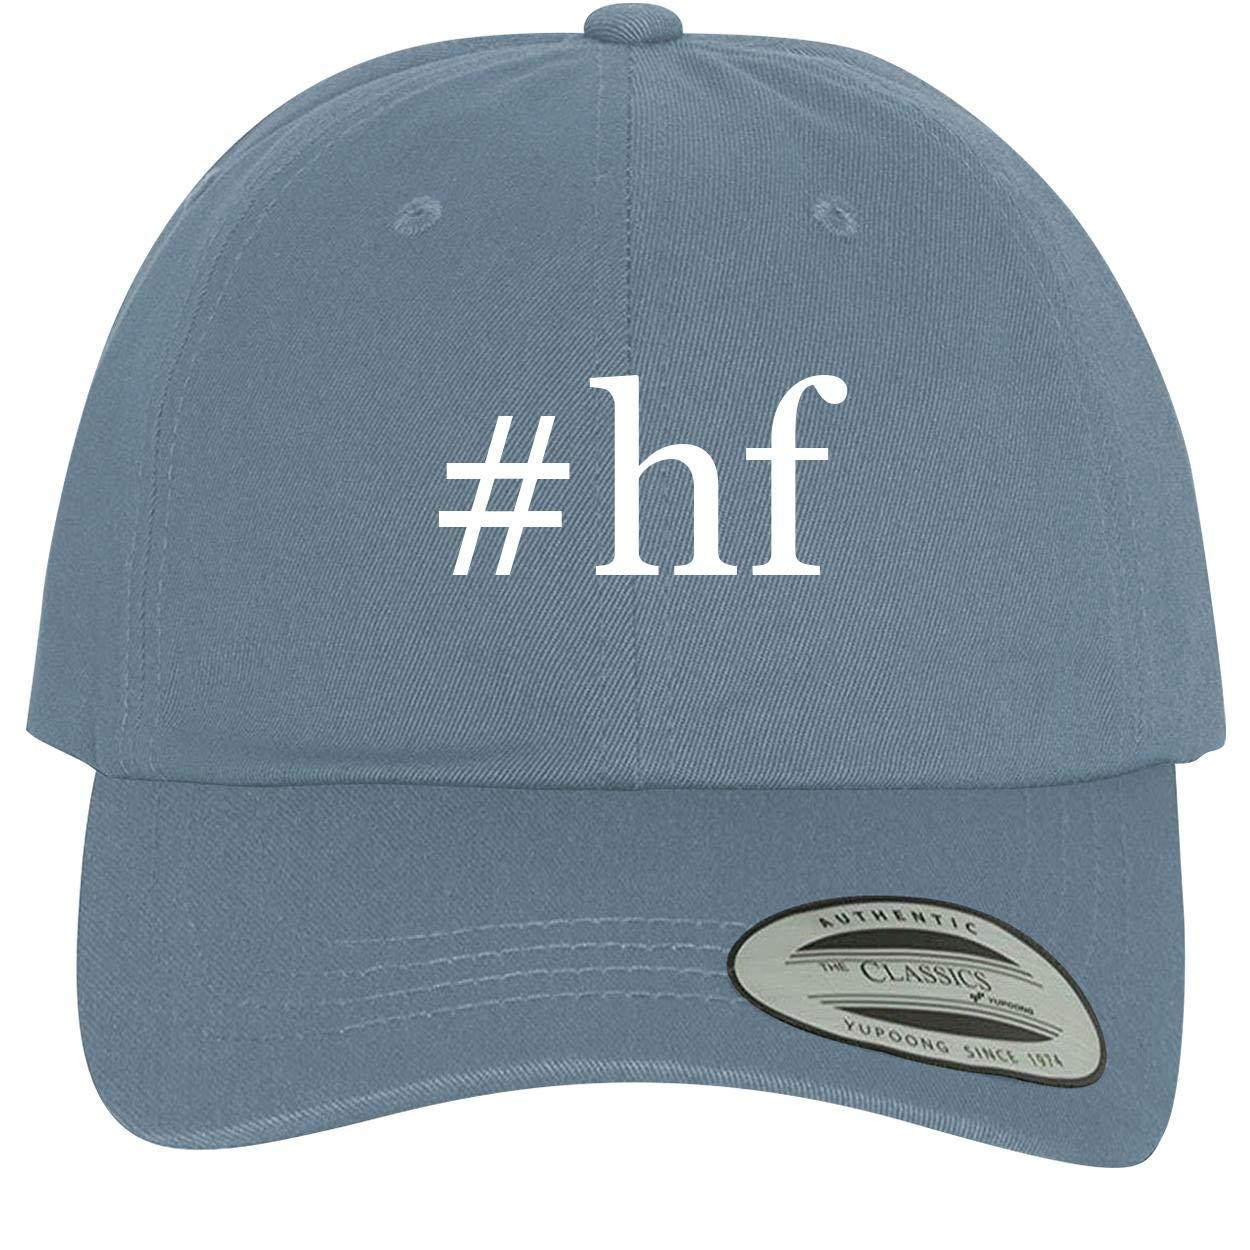 Comfortable Dad Hat Baseball Cap BH Cool Designs #hf